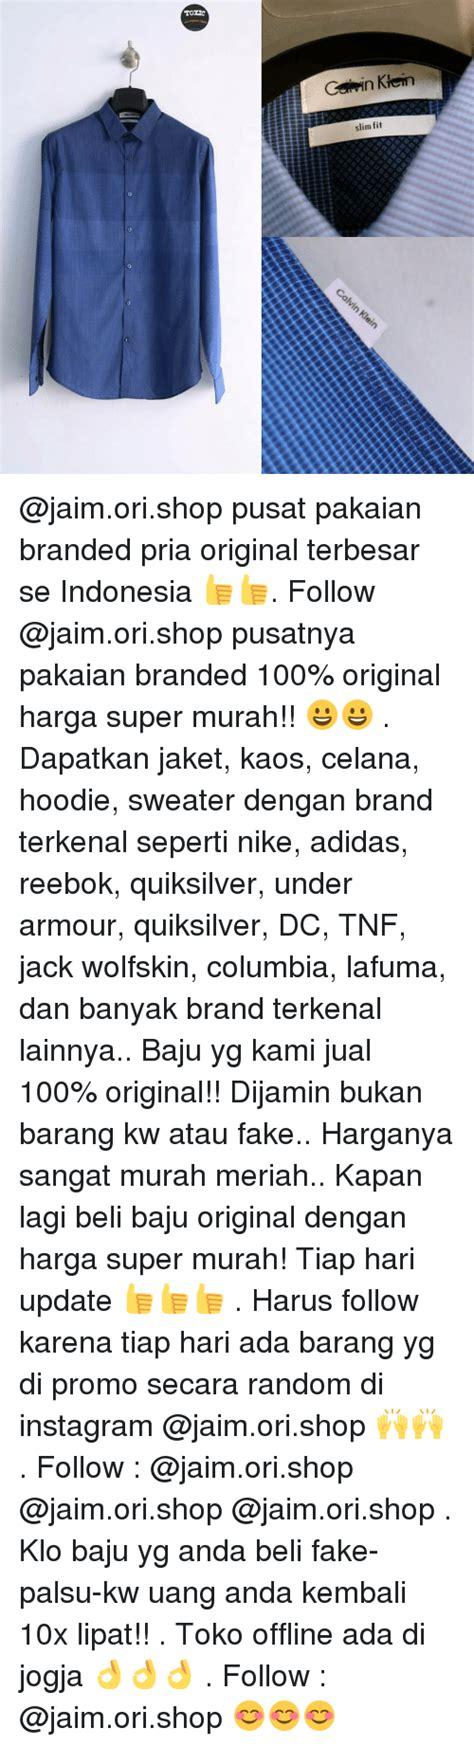 X Original Palsu Uang Kembali 10x Lipat 25 best memes about tnf tnf memes